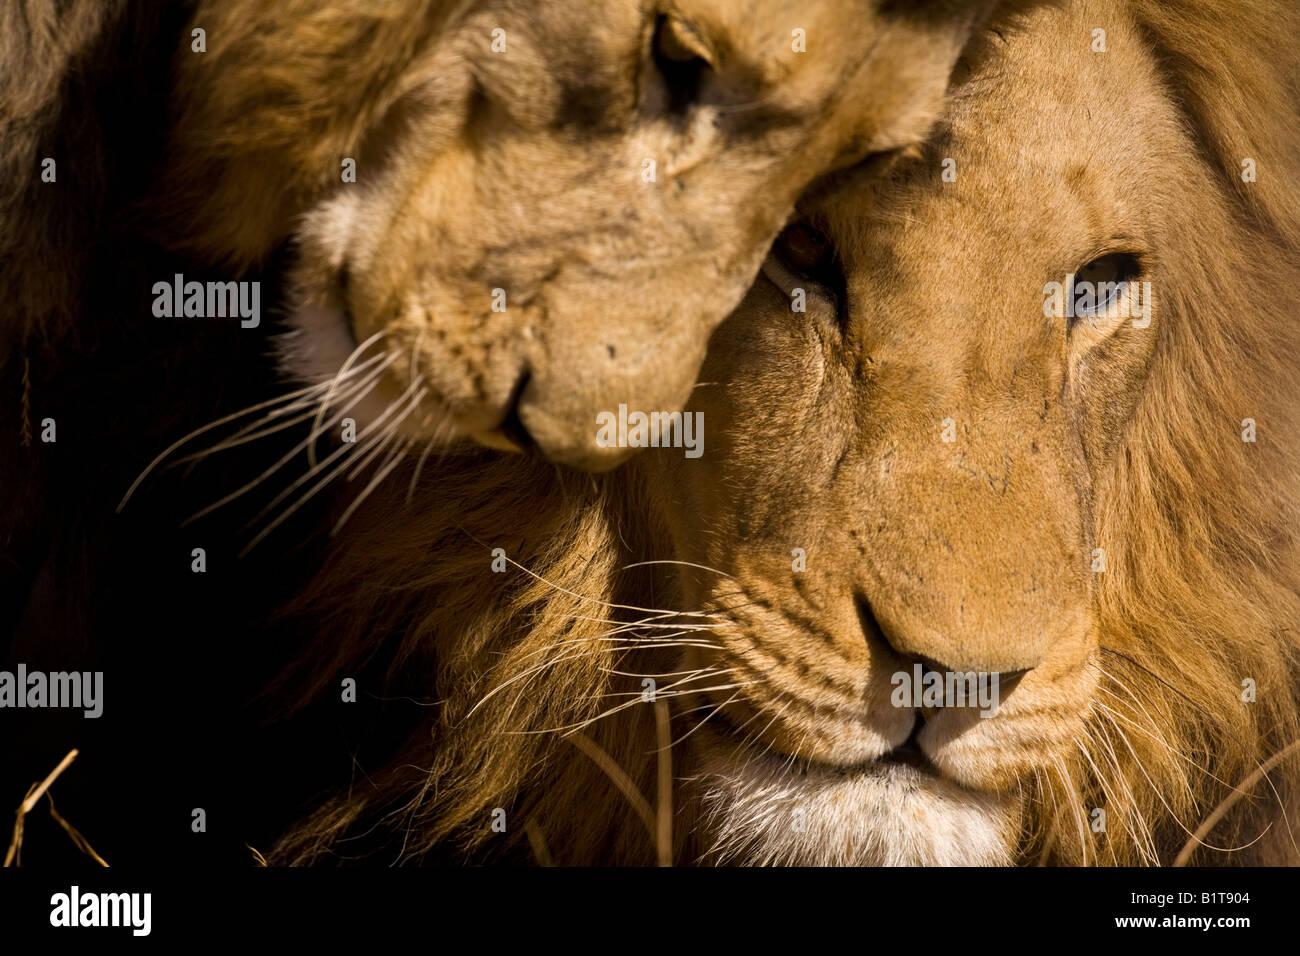 Male lions bonding - Stock Image